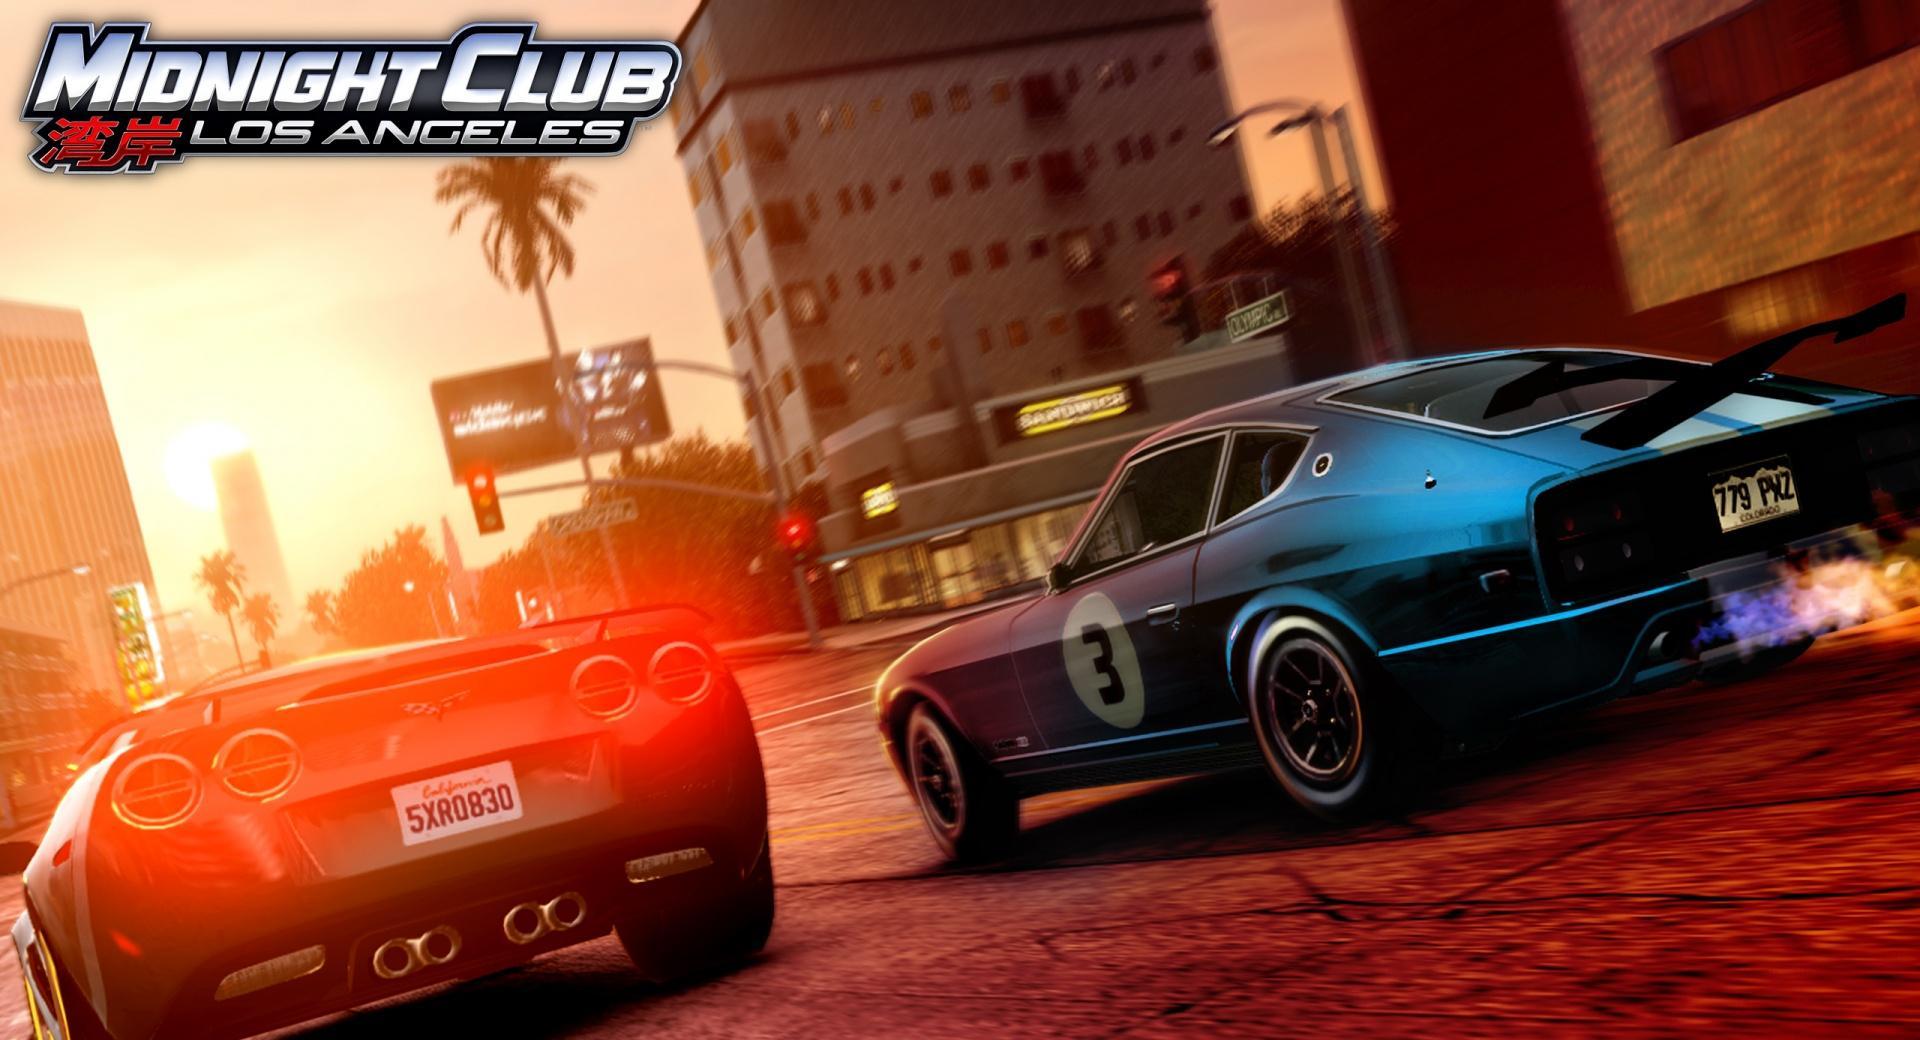 Midnight Club Los Angeles Corvette vs 280Z wallpapers HD quality